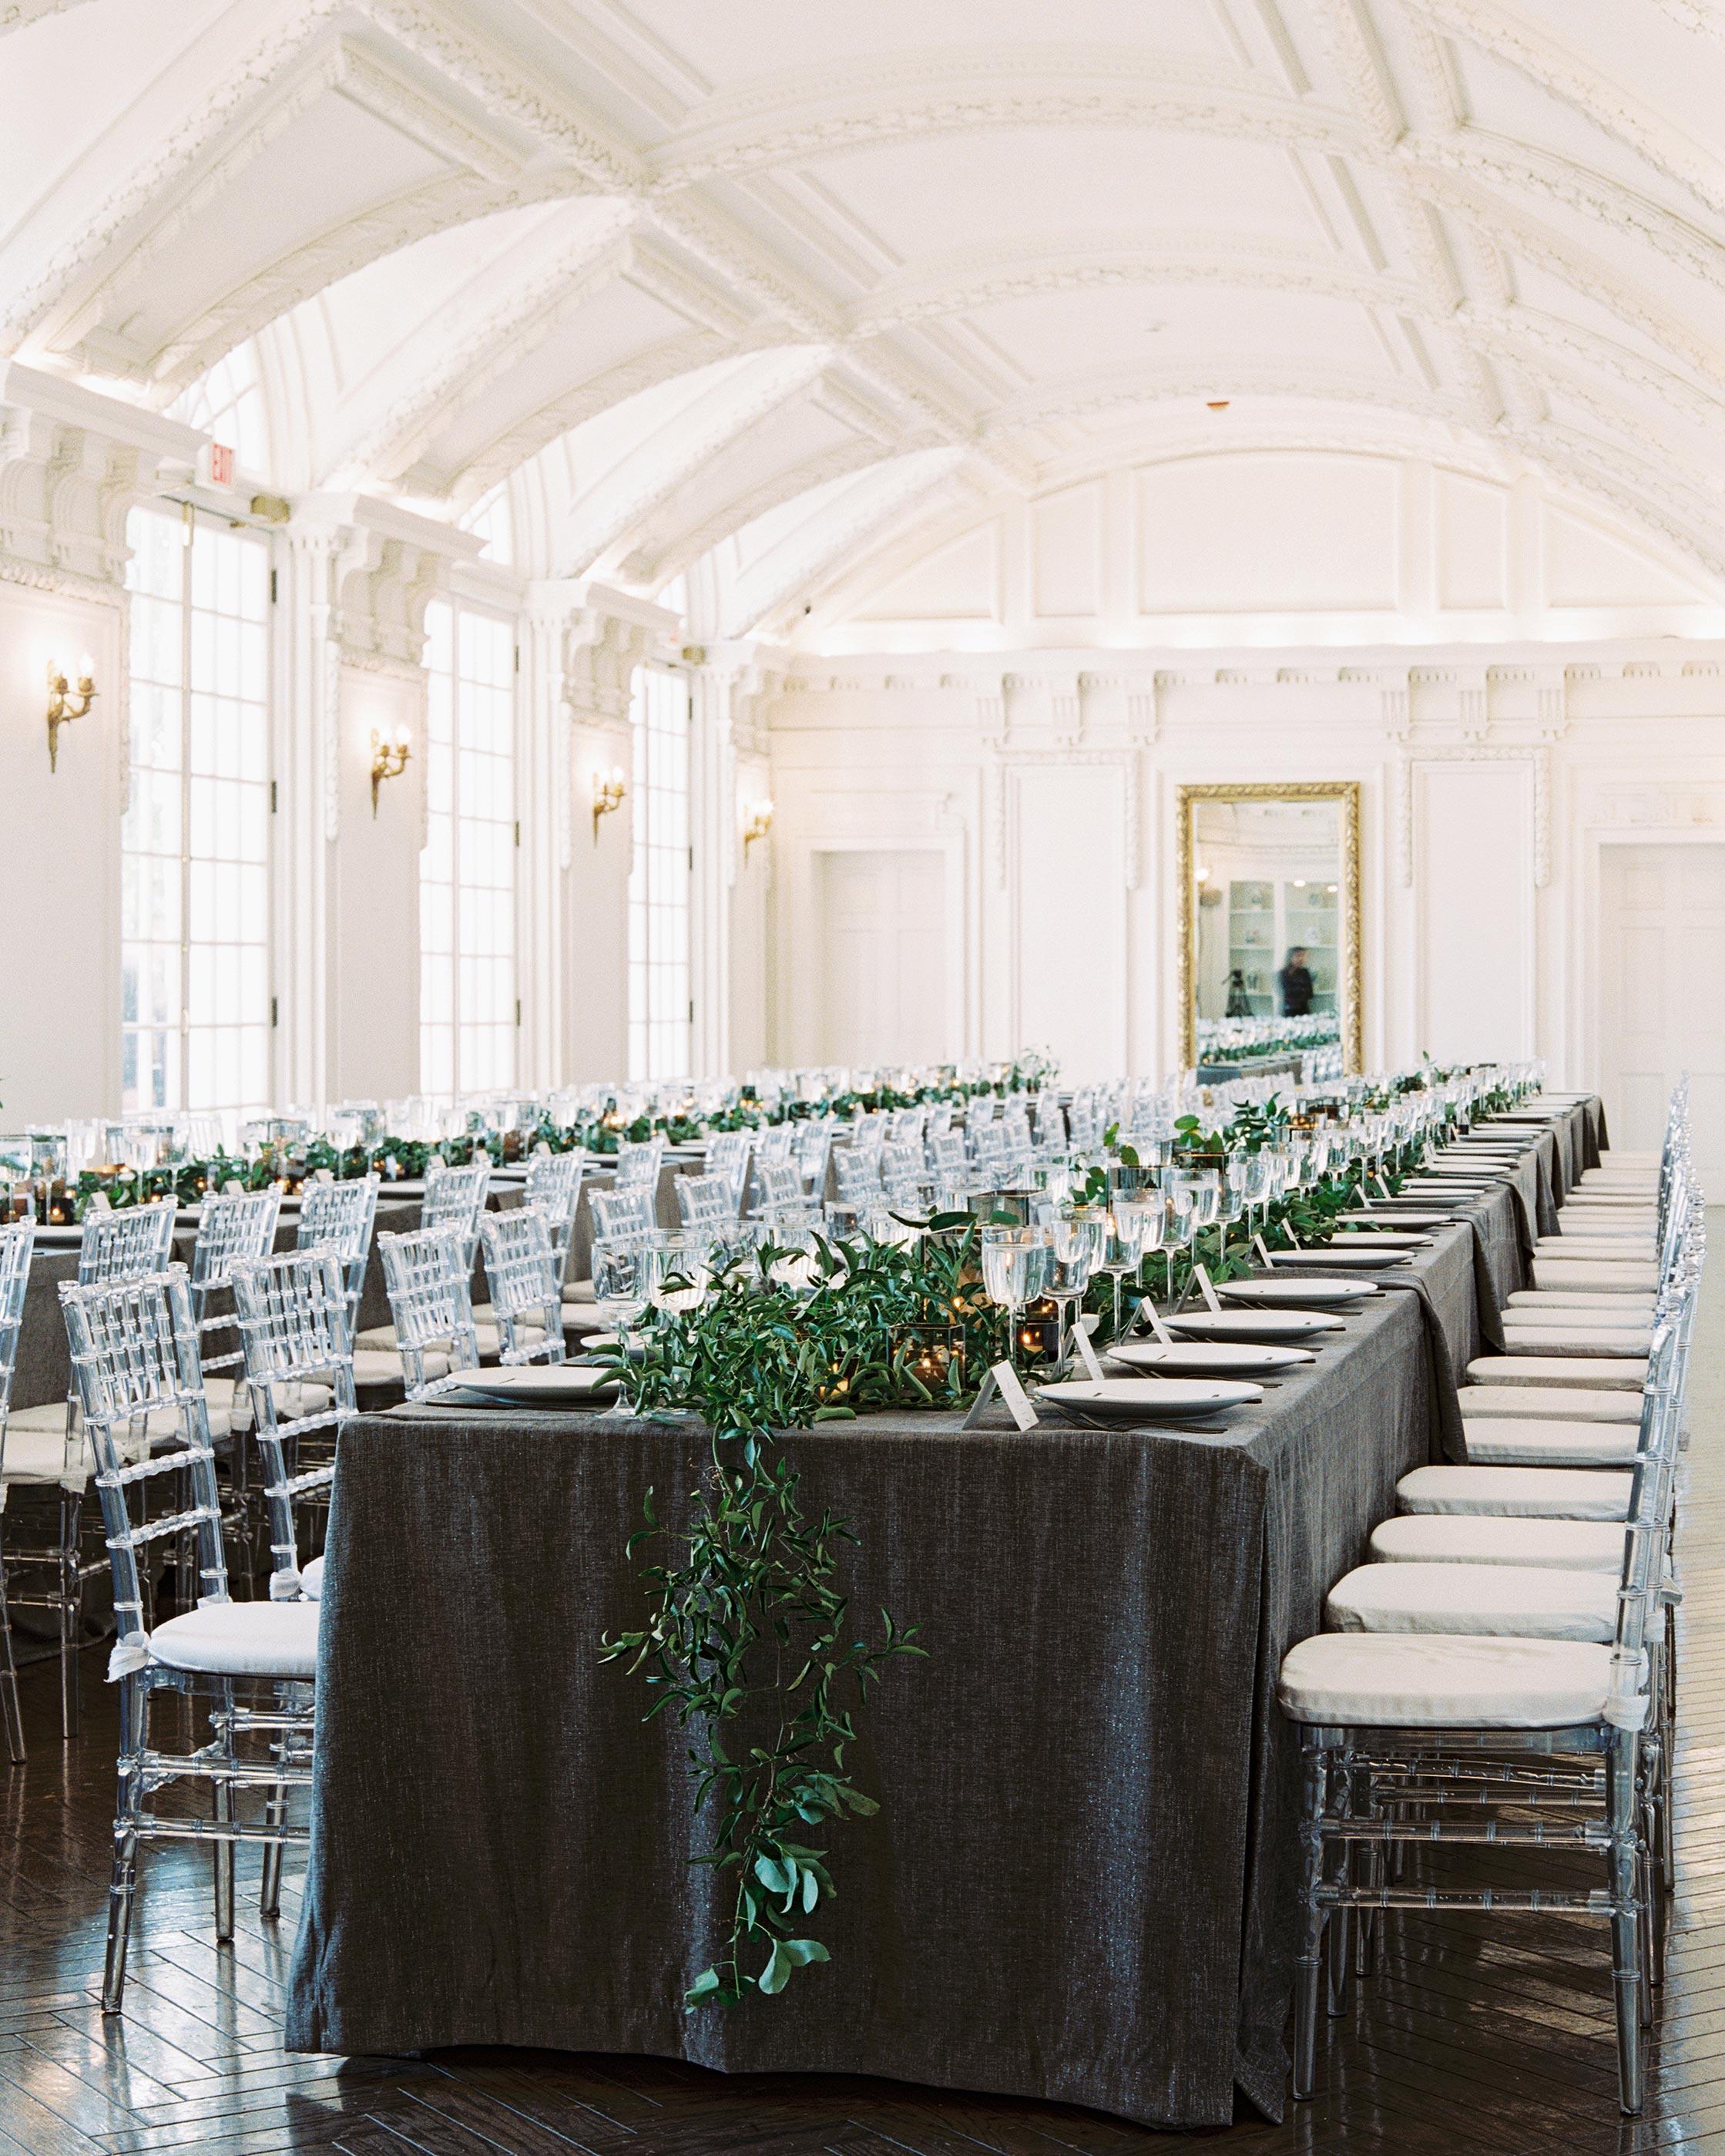 arielle-matt-wedding-tables-11-6134241-0716.jpg